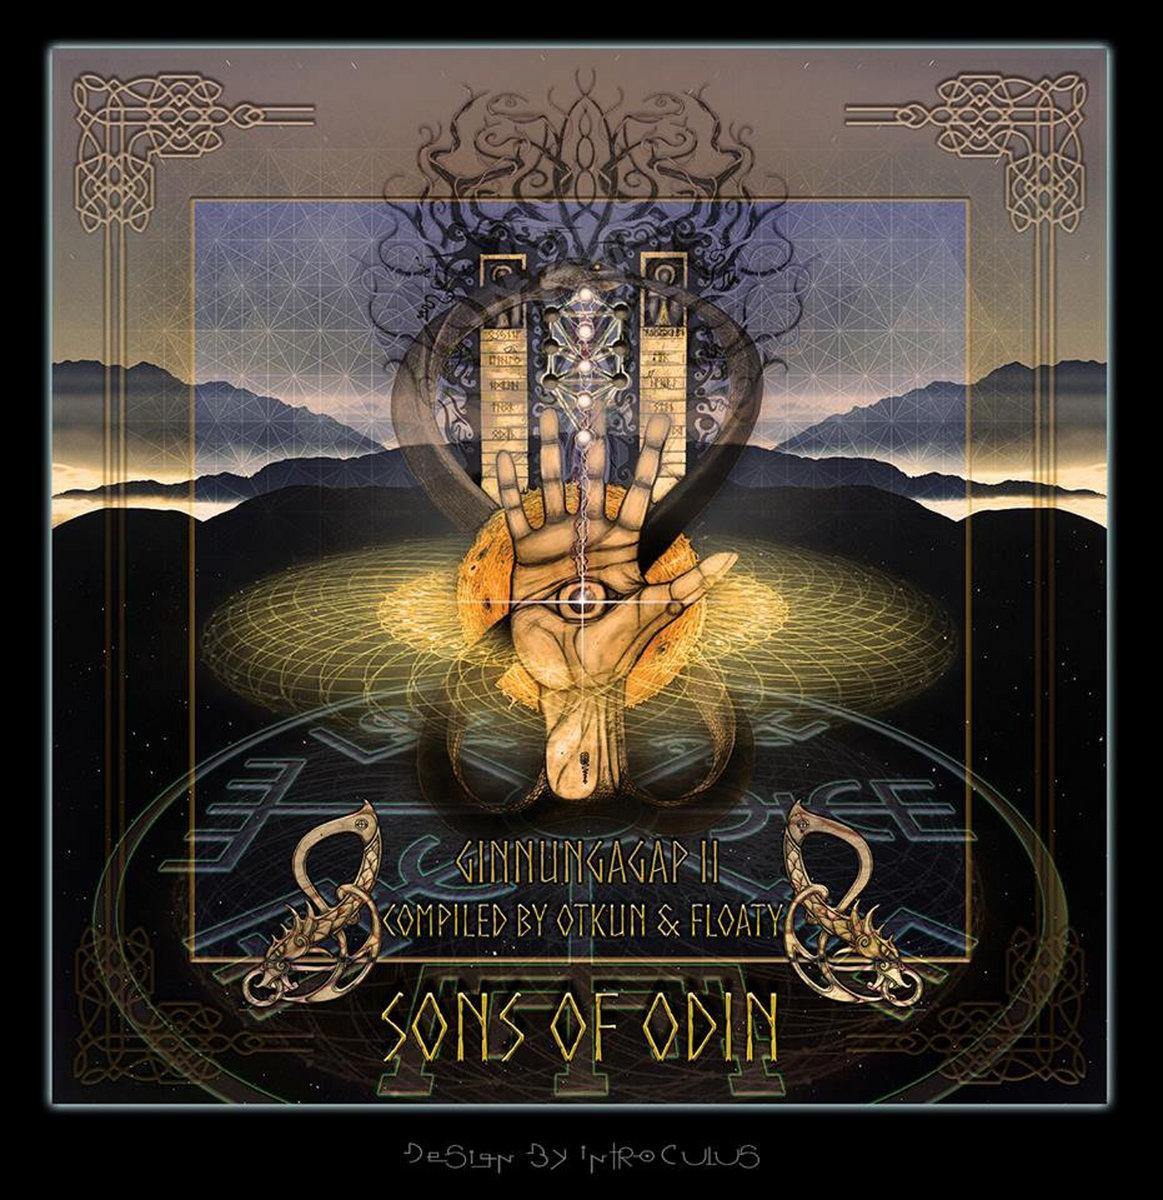 V / A GINNUNGAGAP volume 2: Sons of Odin | Voodoo Hoodoo